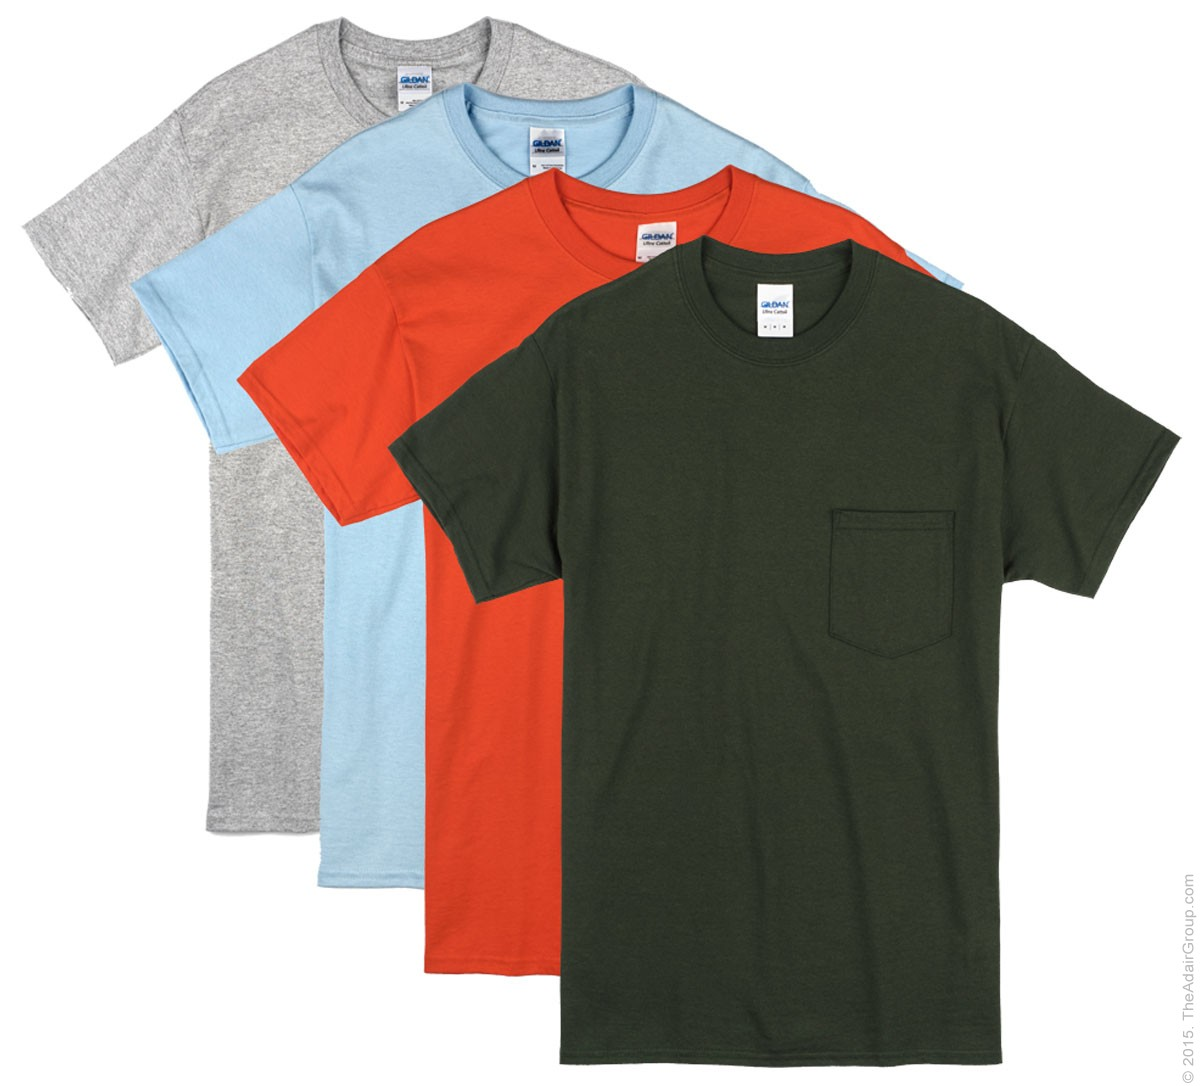 up-to-datestyling hot sale convenience goods Chevron Pocket T Shirts Wholesale | Azərbaycan Dillər ...